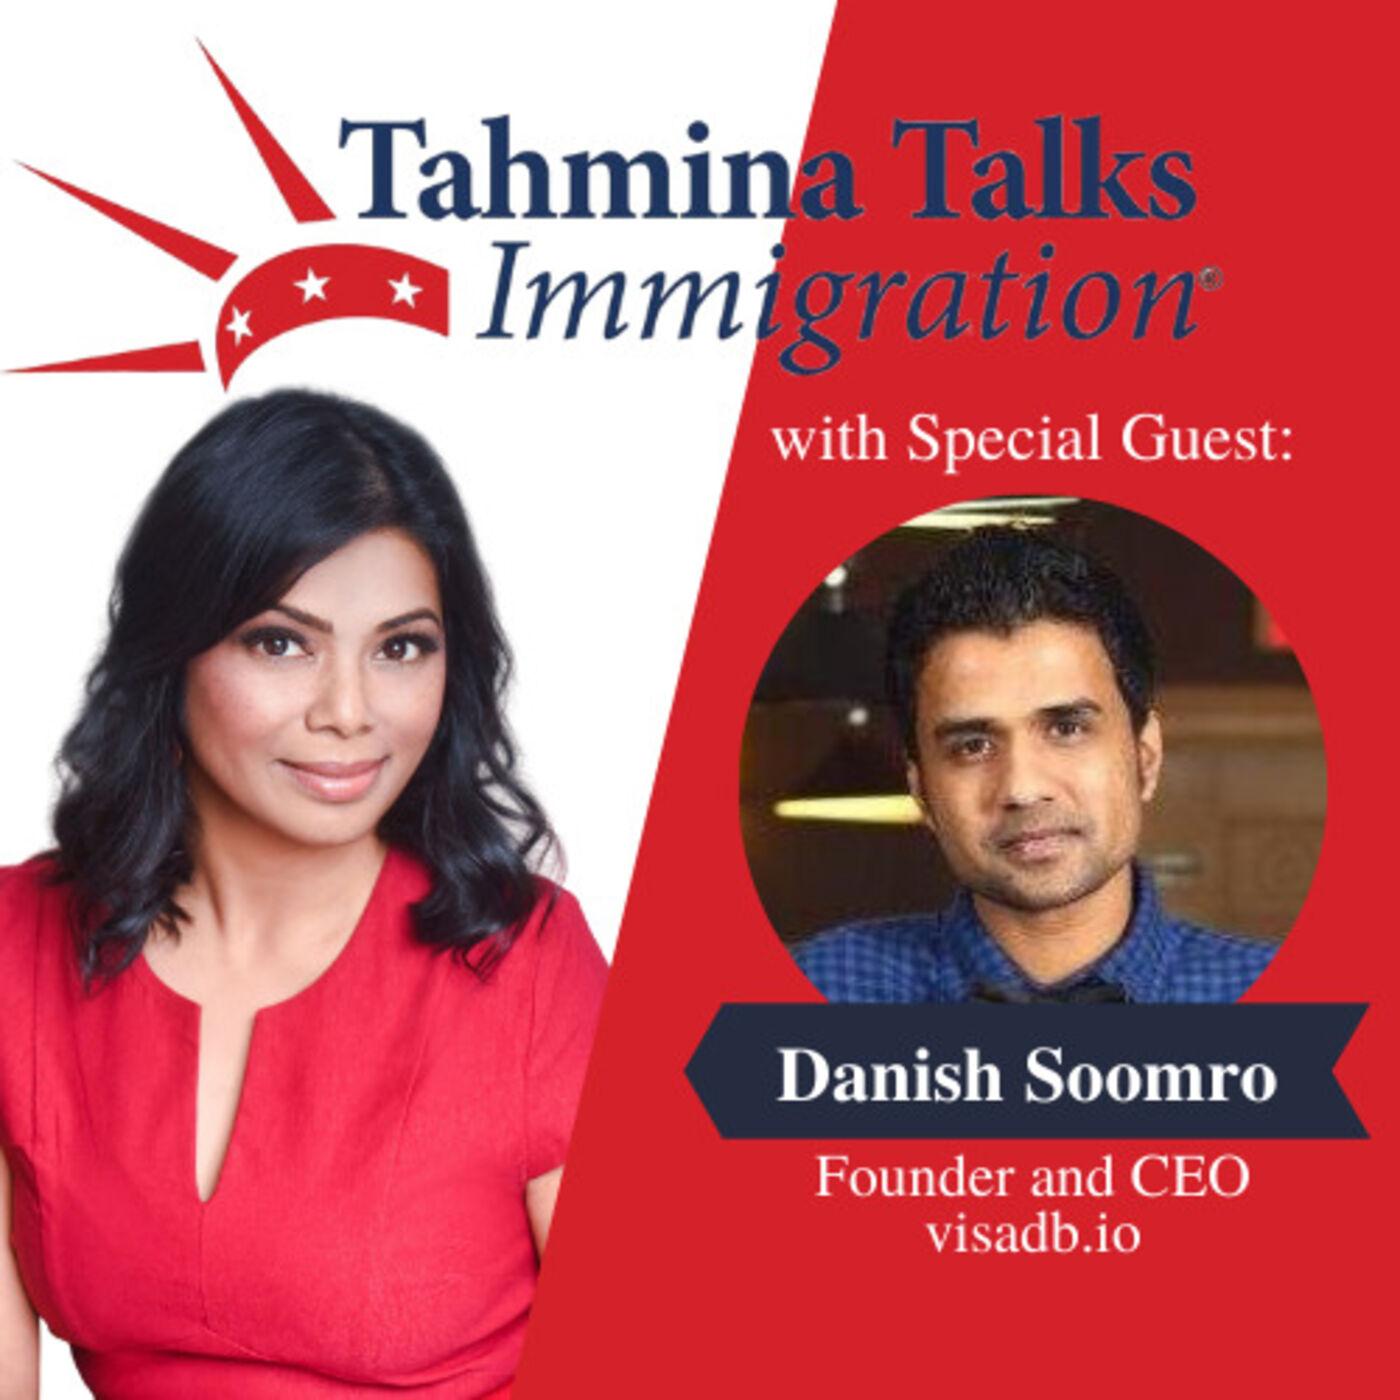 #124 Startup Visa Series - Danish Soomro, Founder and CEO, visadb.io